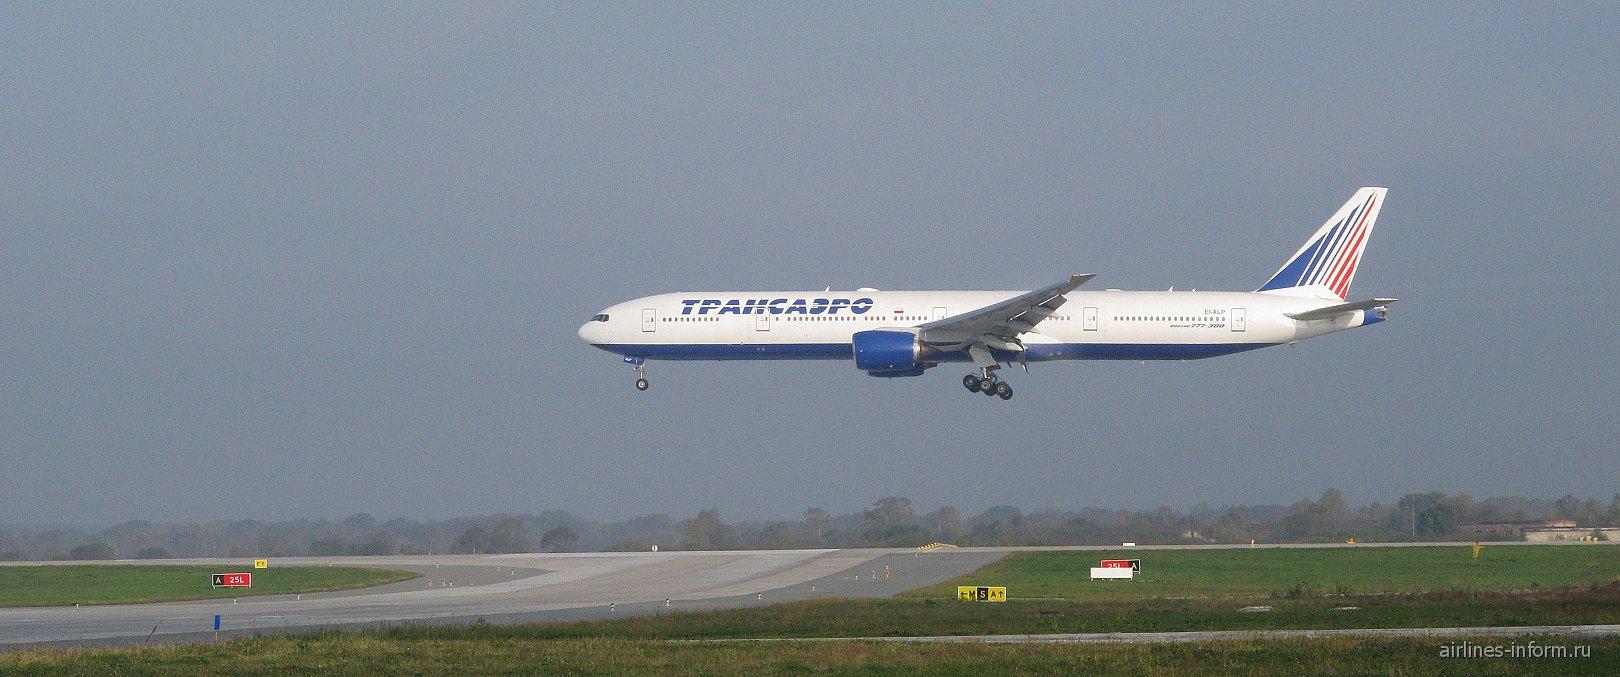 Боинг-777-300 Трансаэро в аэропорту Владивостока